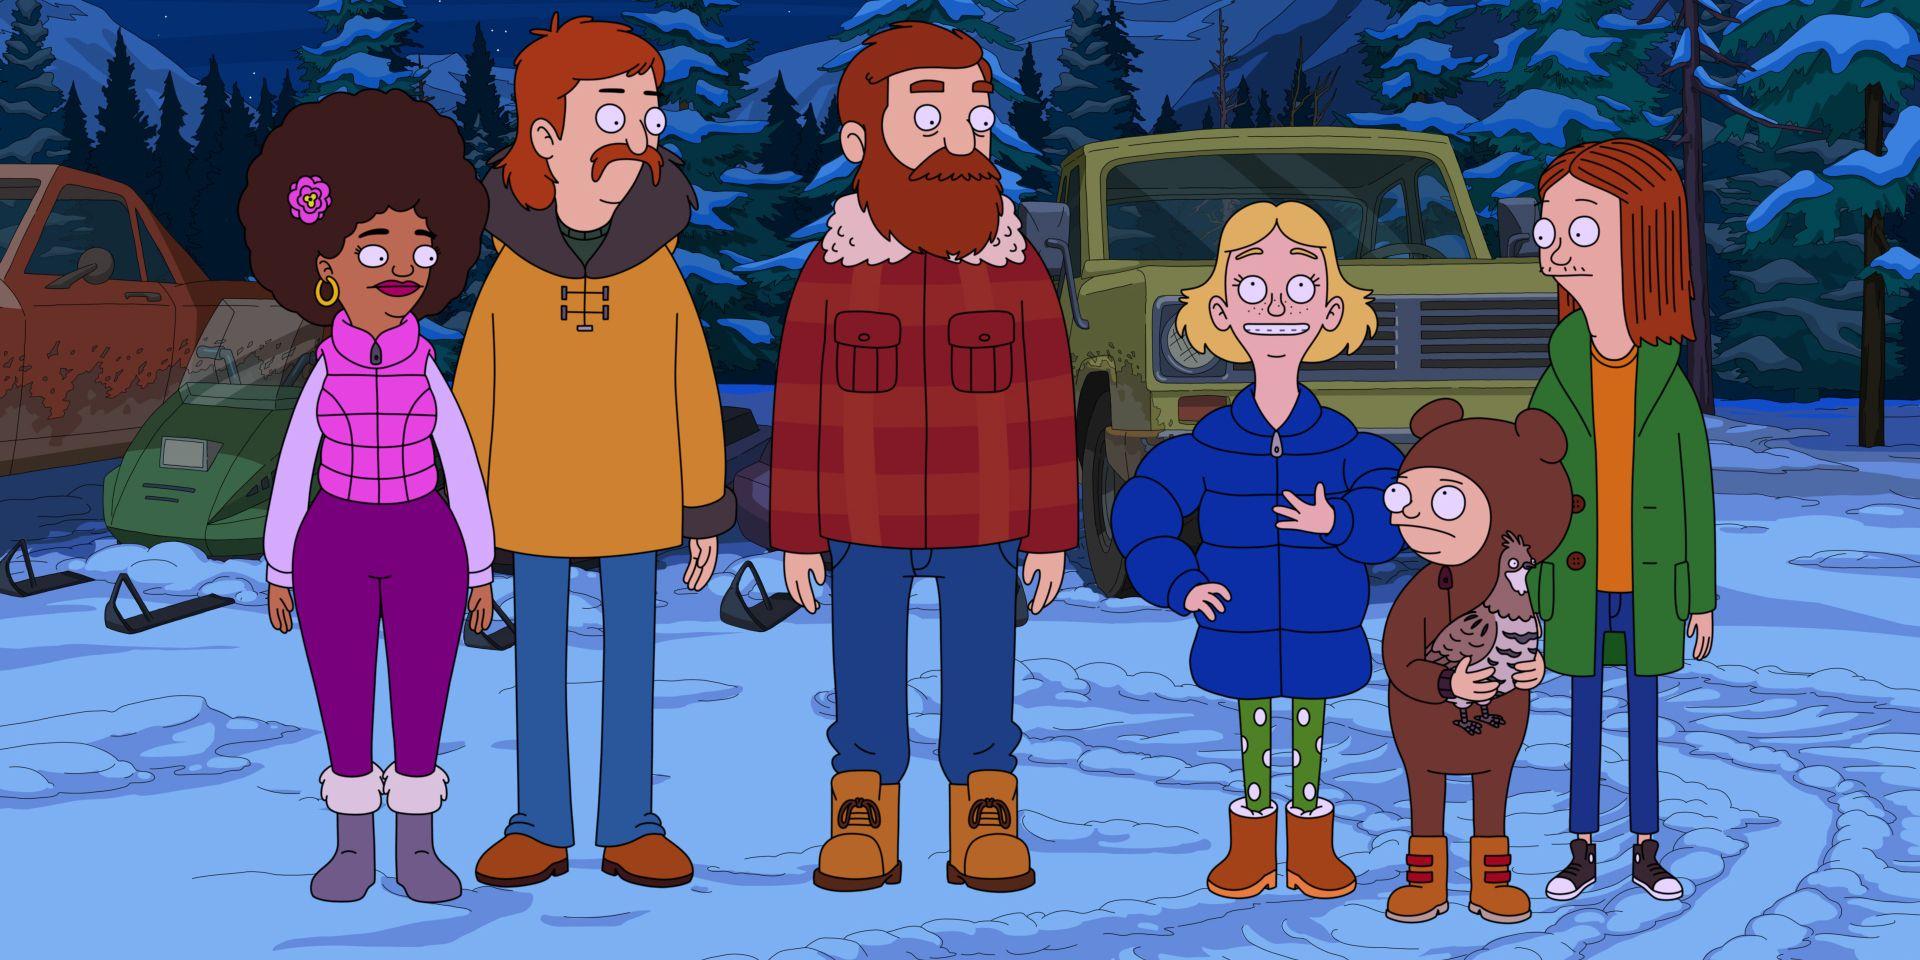 Crítica de 'The Great North': É engraçado e encantador dá conta do recado 1